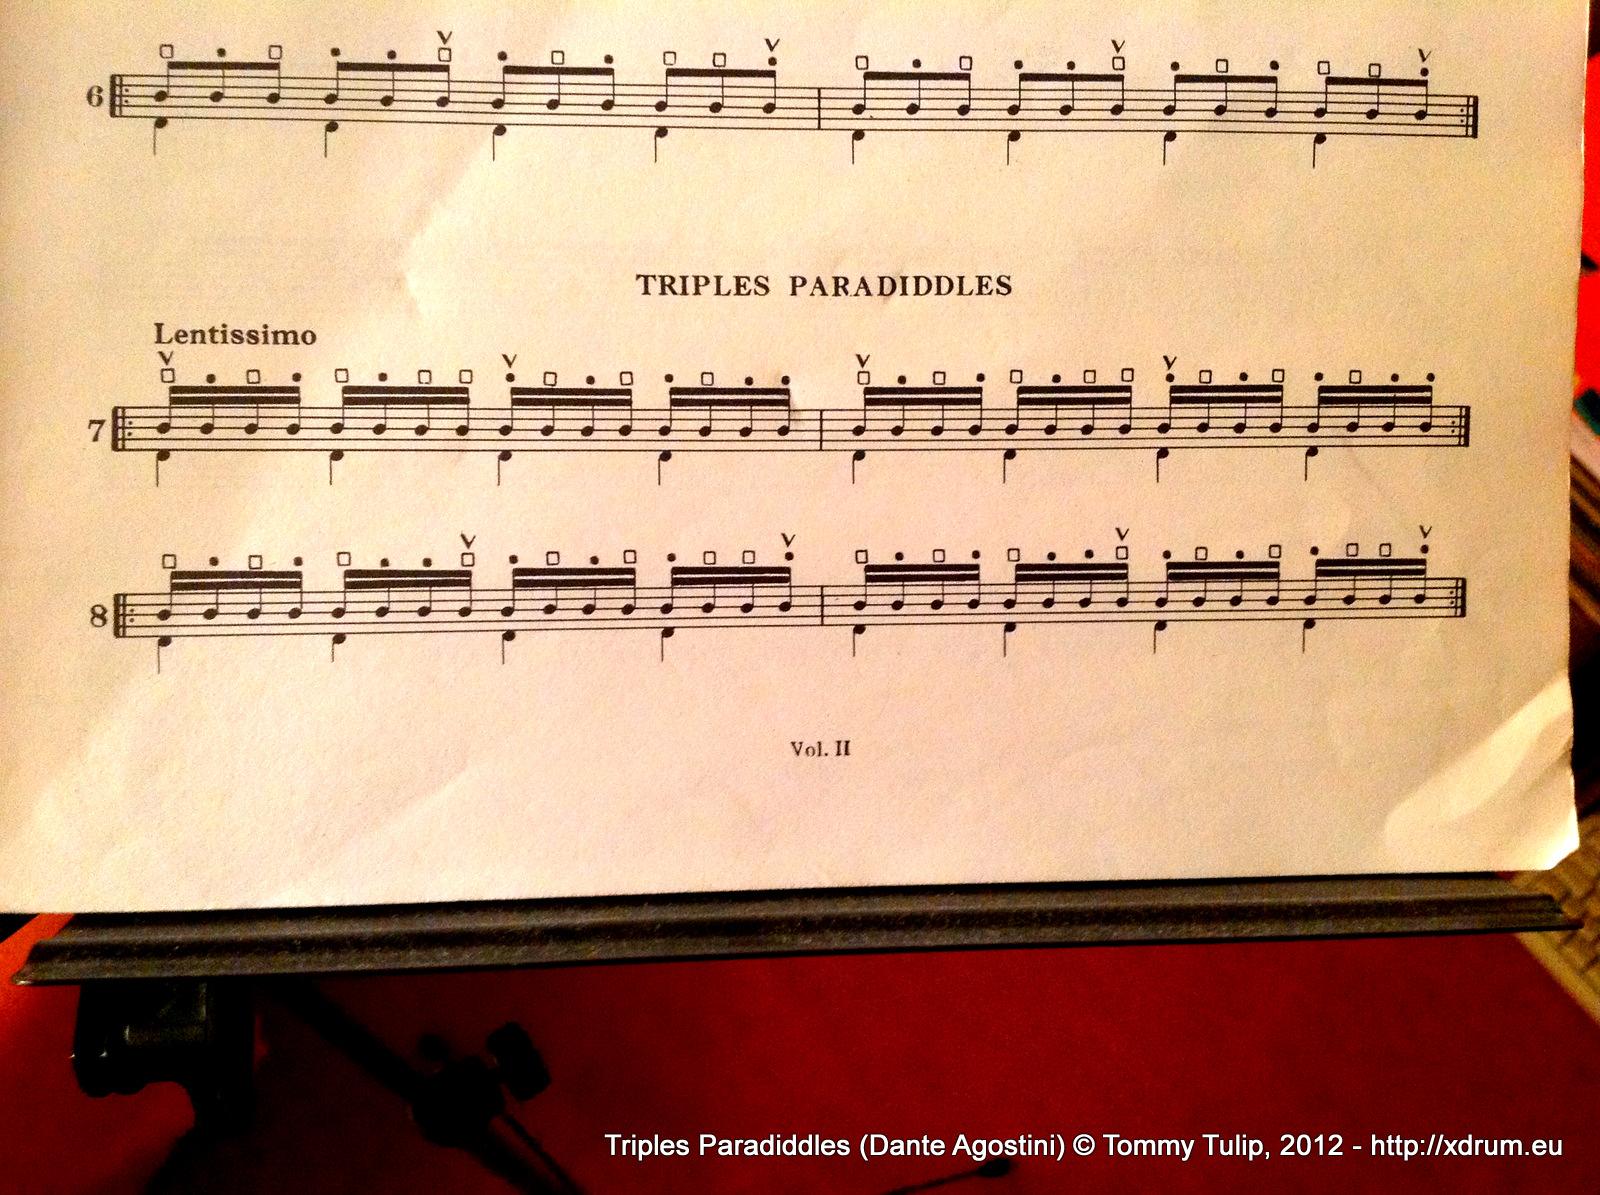 Triples Paradiddles (Dante Agostini)